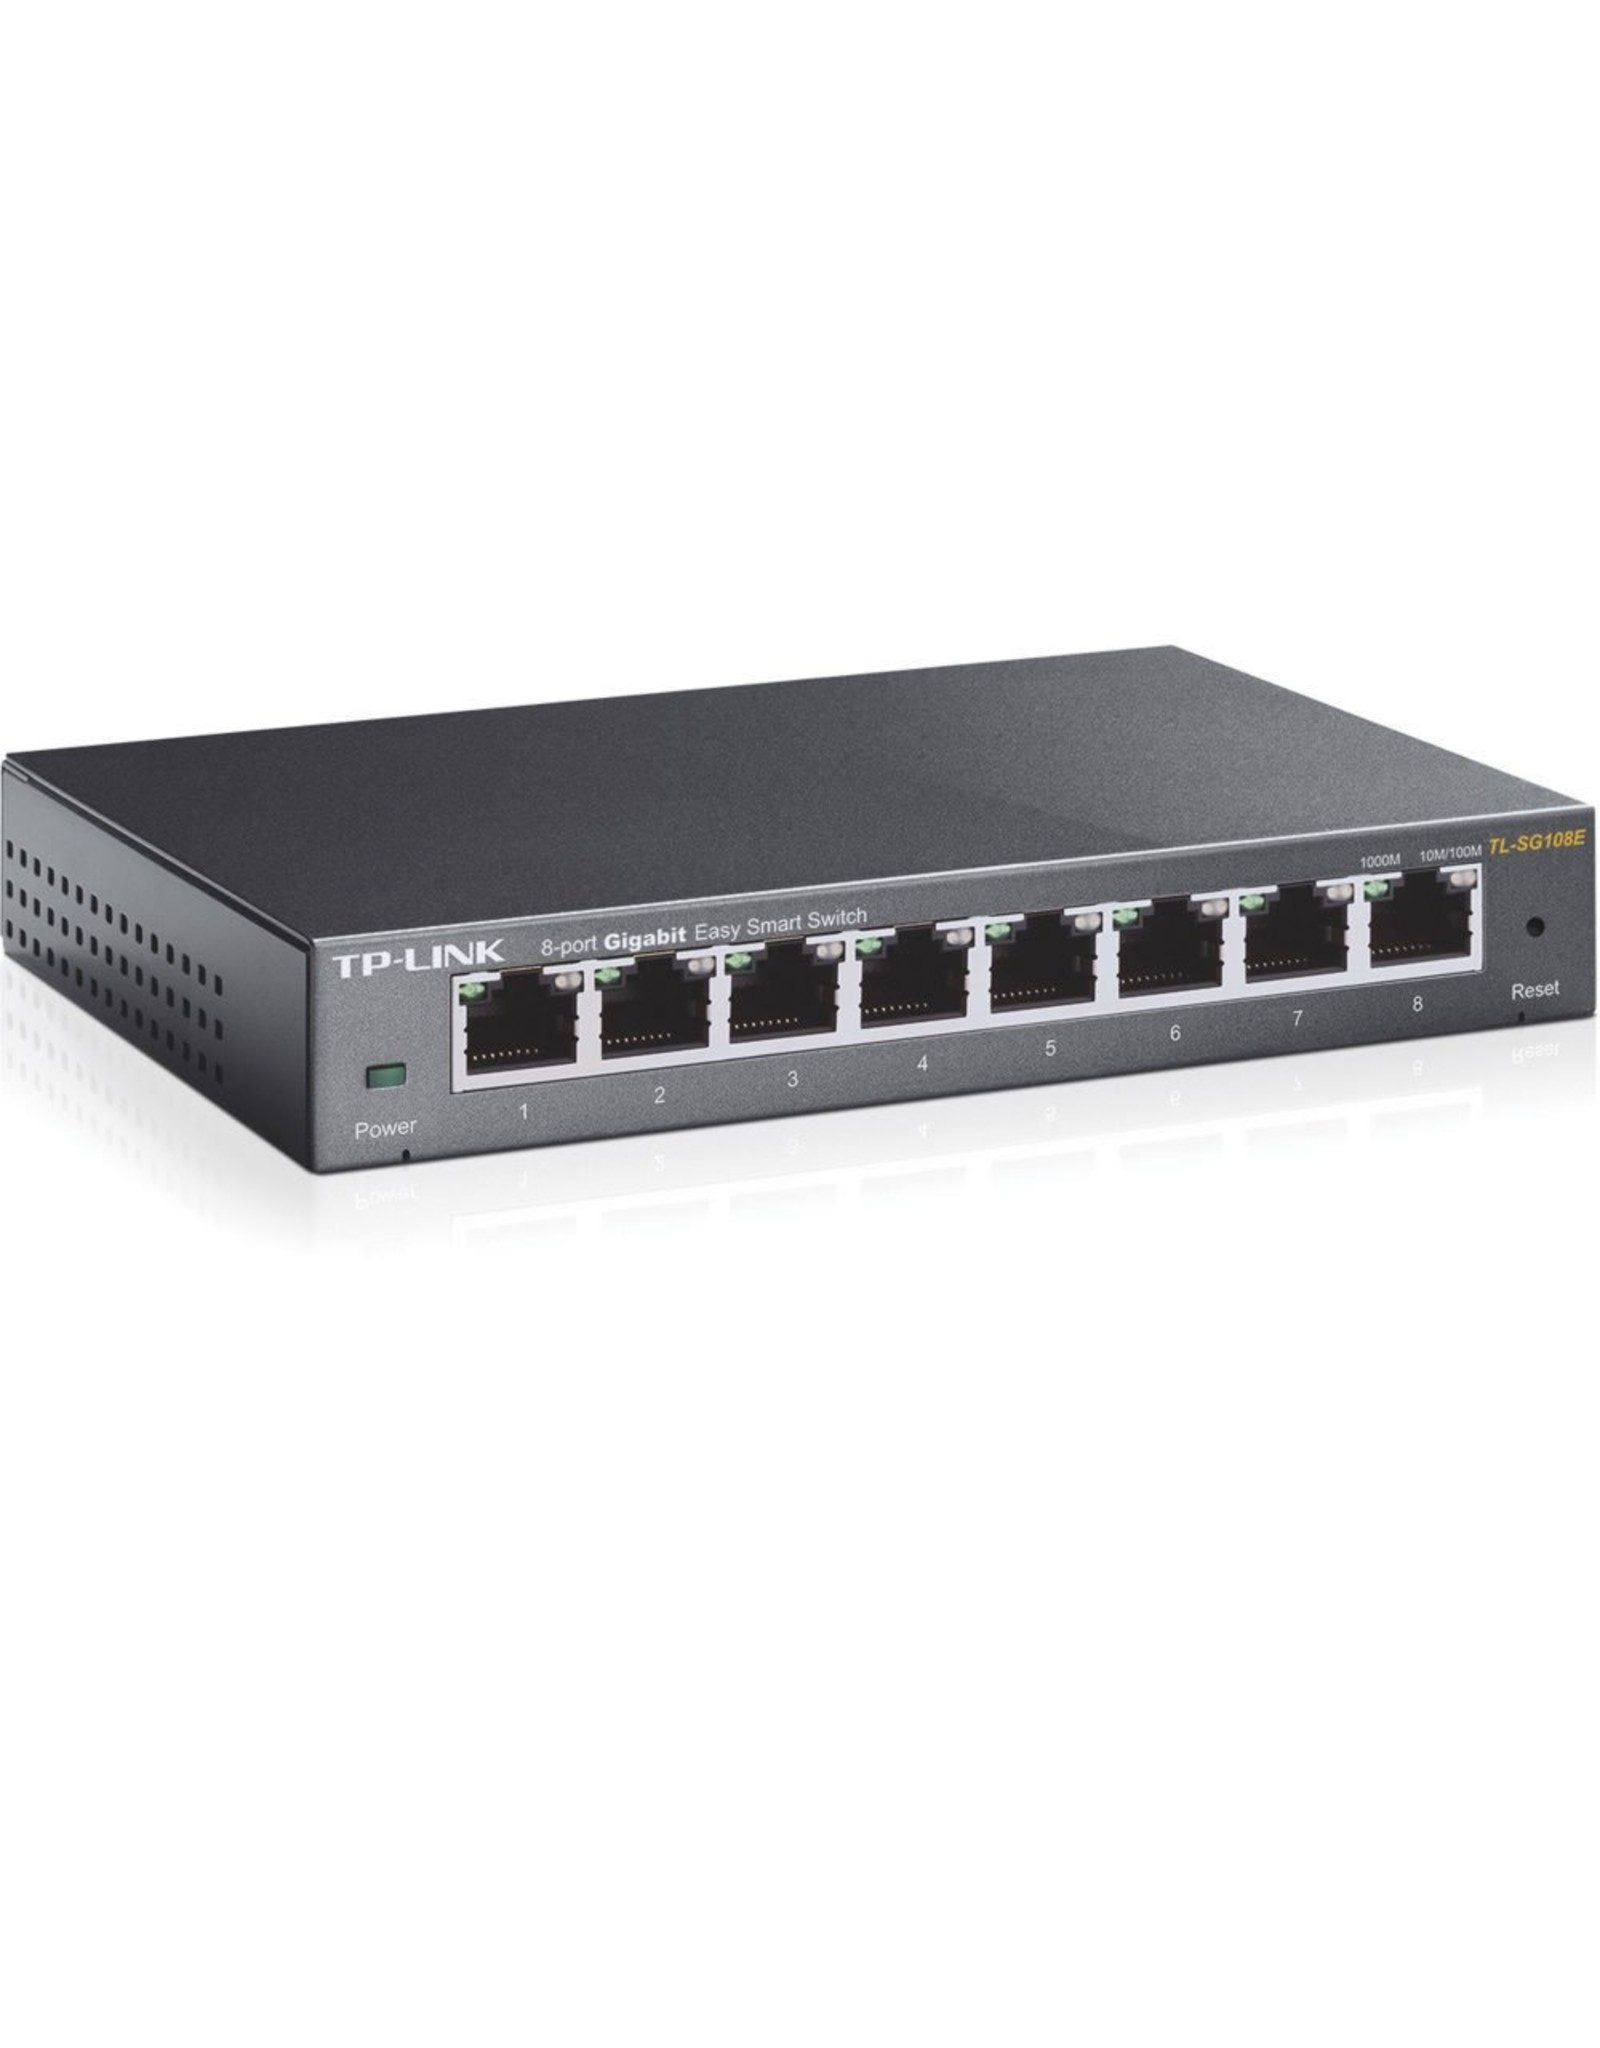 TP-Link 8-Port Gigabit Easy Smart Switch